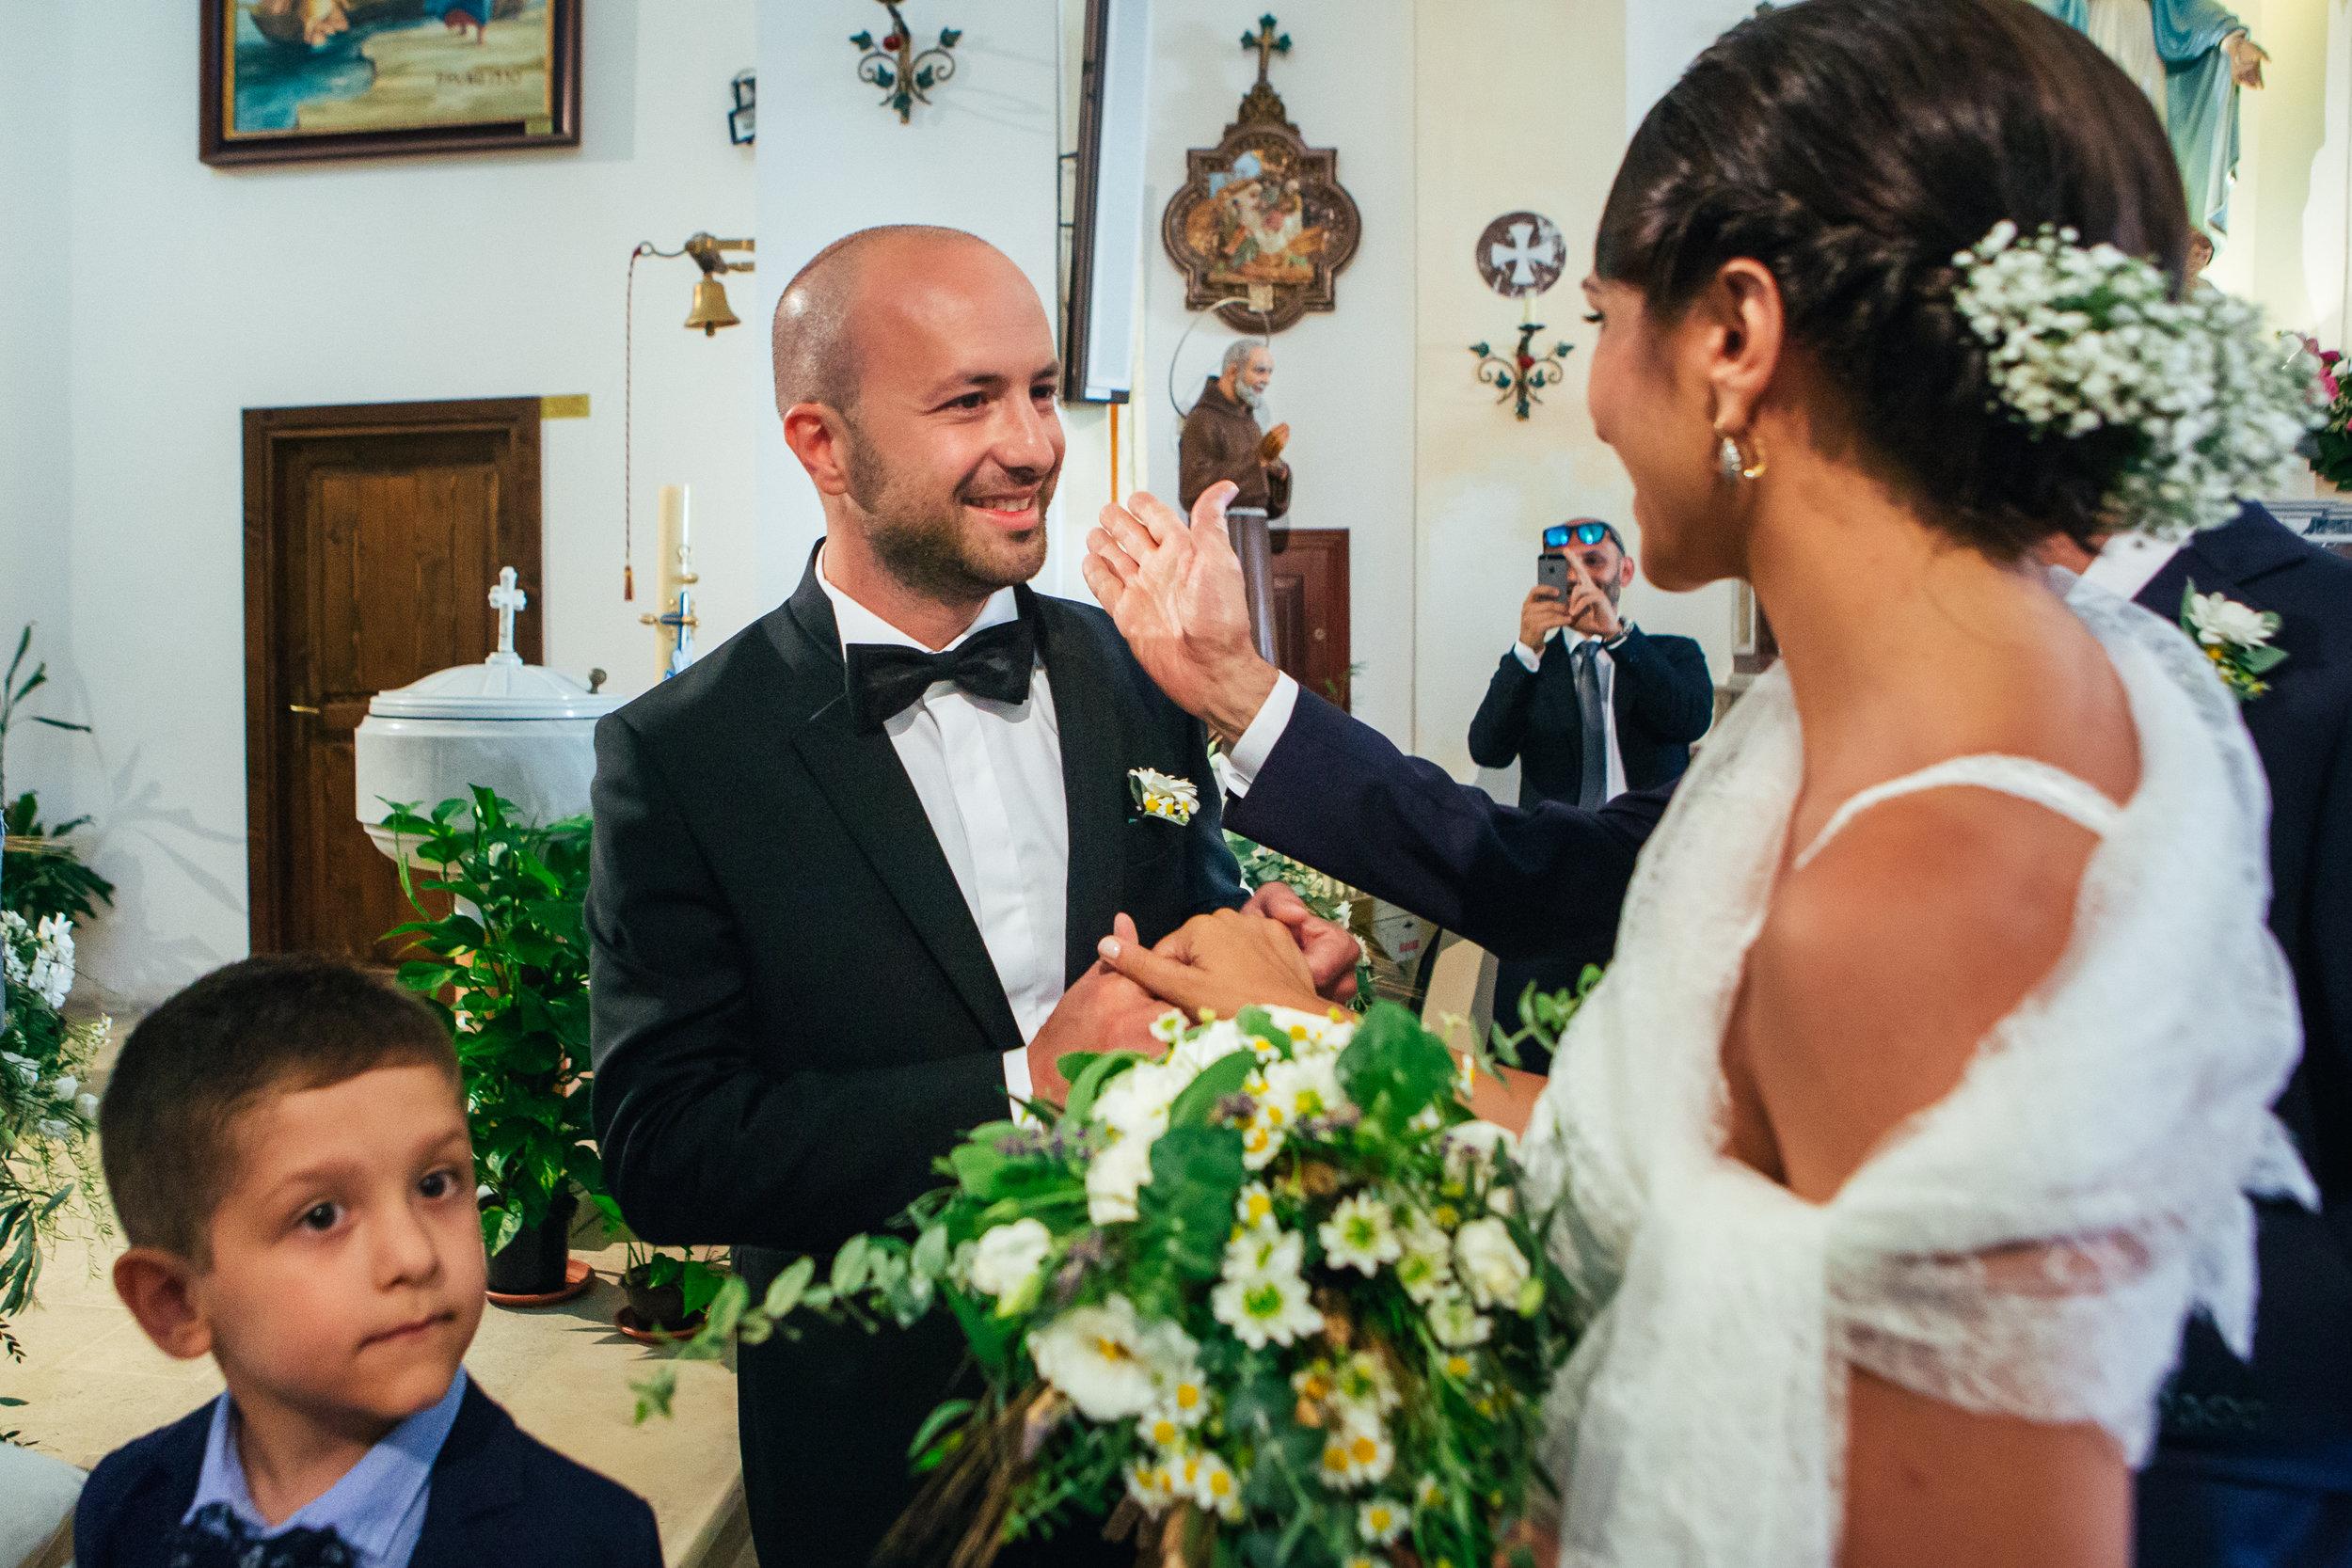 fotografia di matrimonio catania enkant-9.jpg